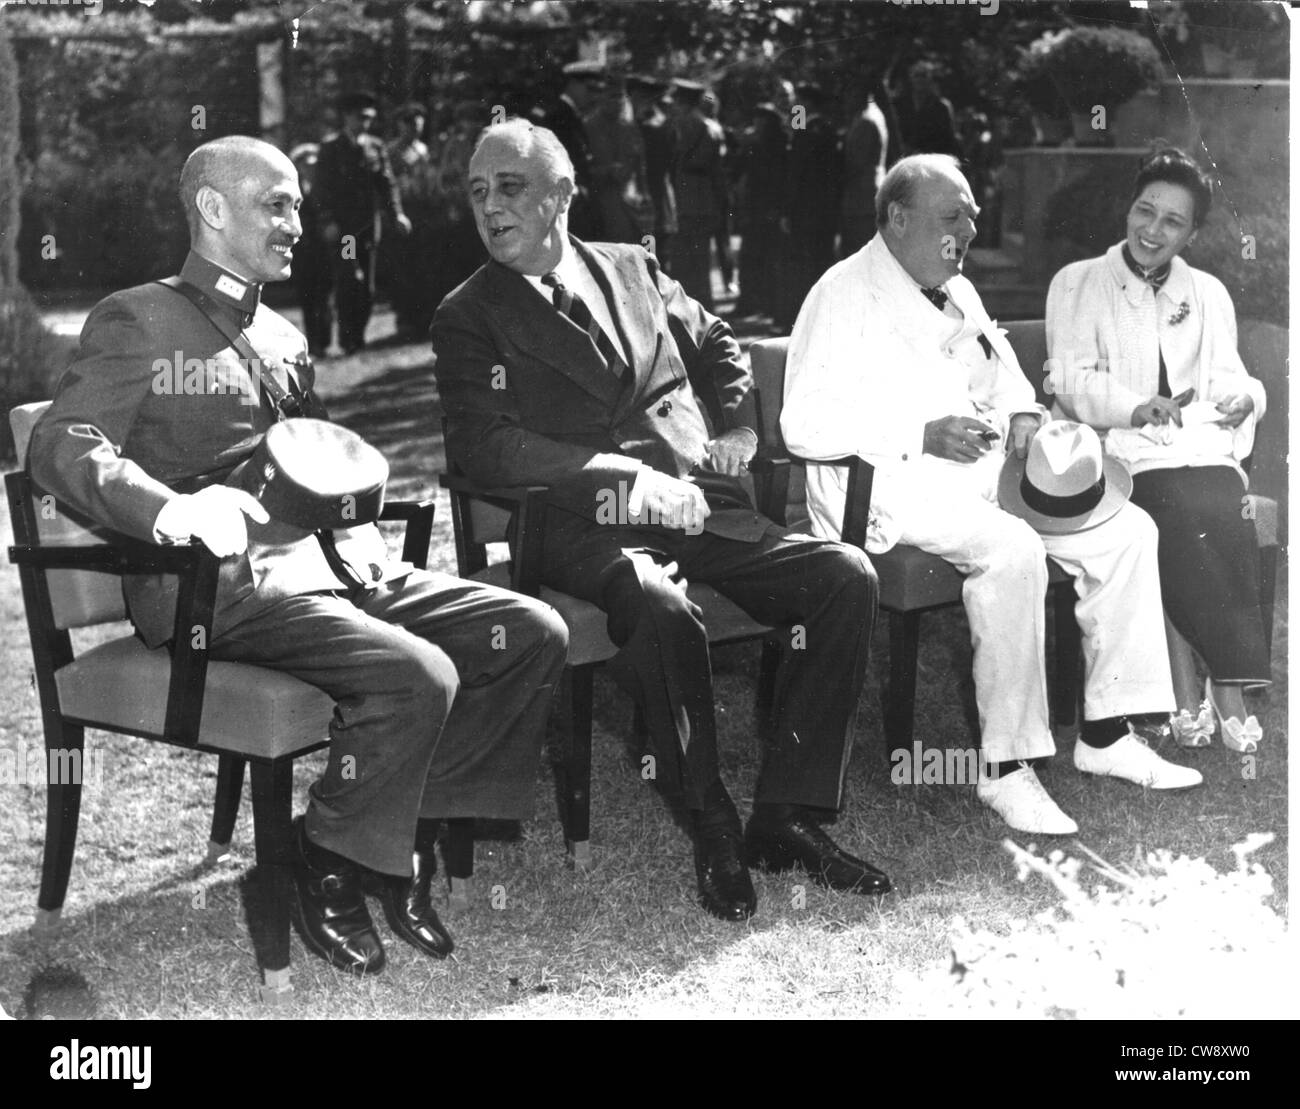 Cairo Conference from left to right: Chiang Kai-Shek Roosevelt Churchill Mrs. Chiang Kai-Shek - Stock Image